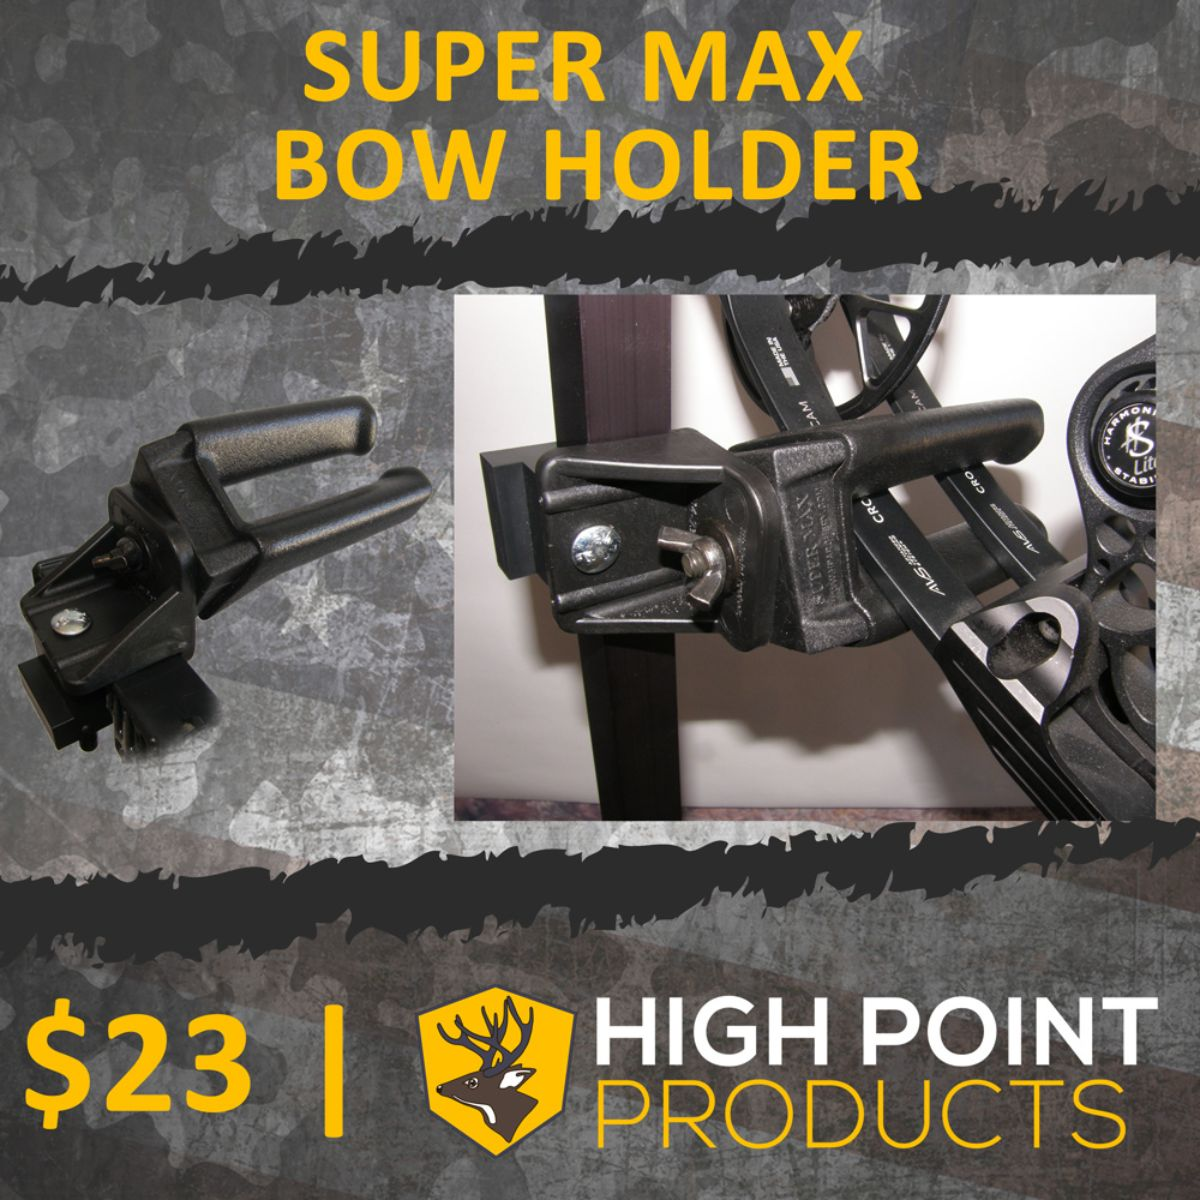 Super Max Bow Holder